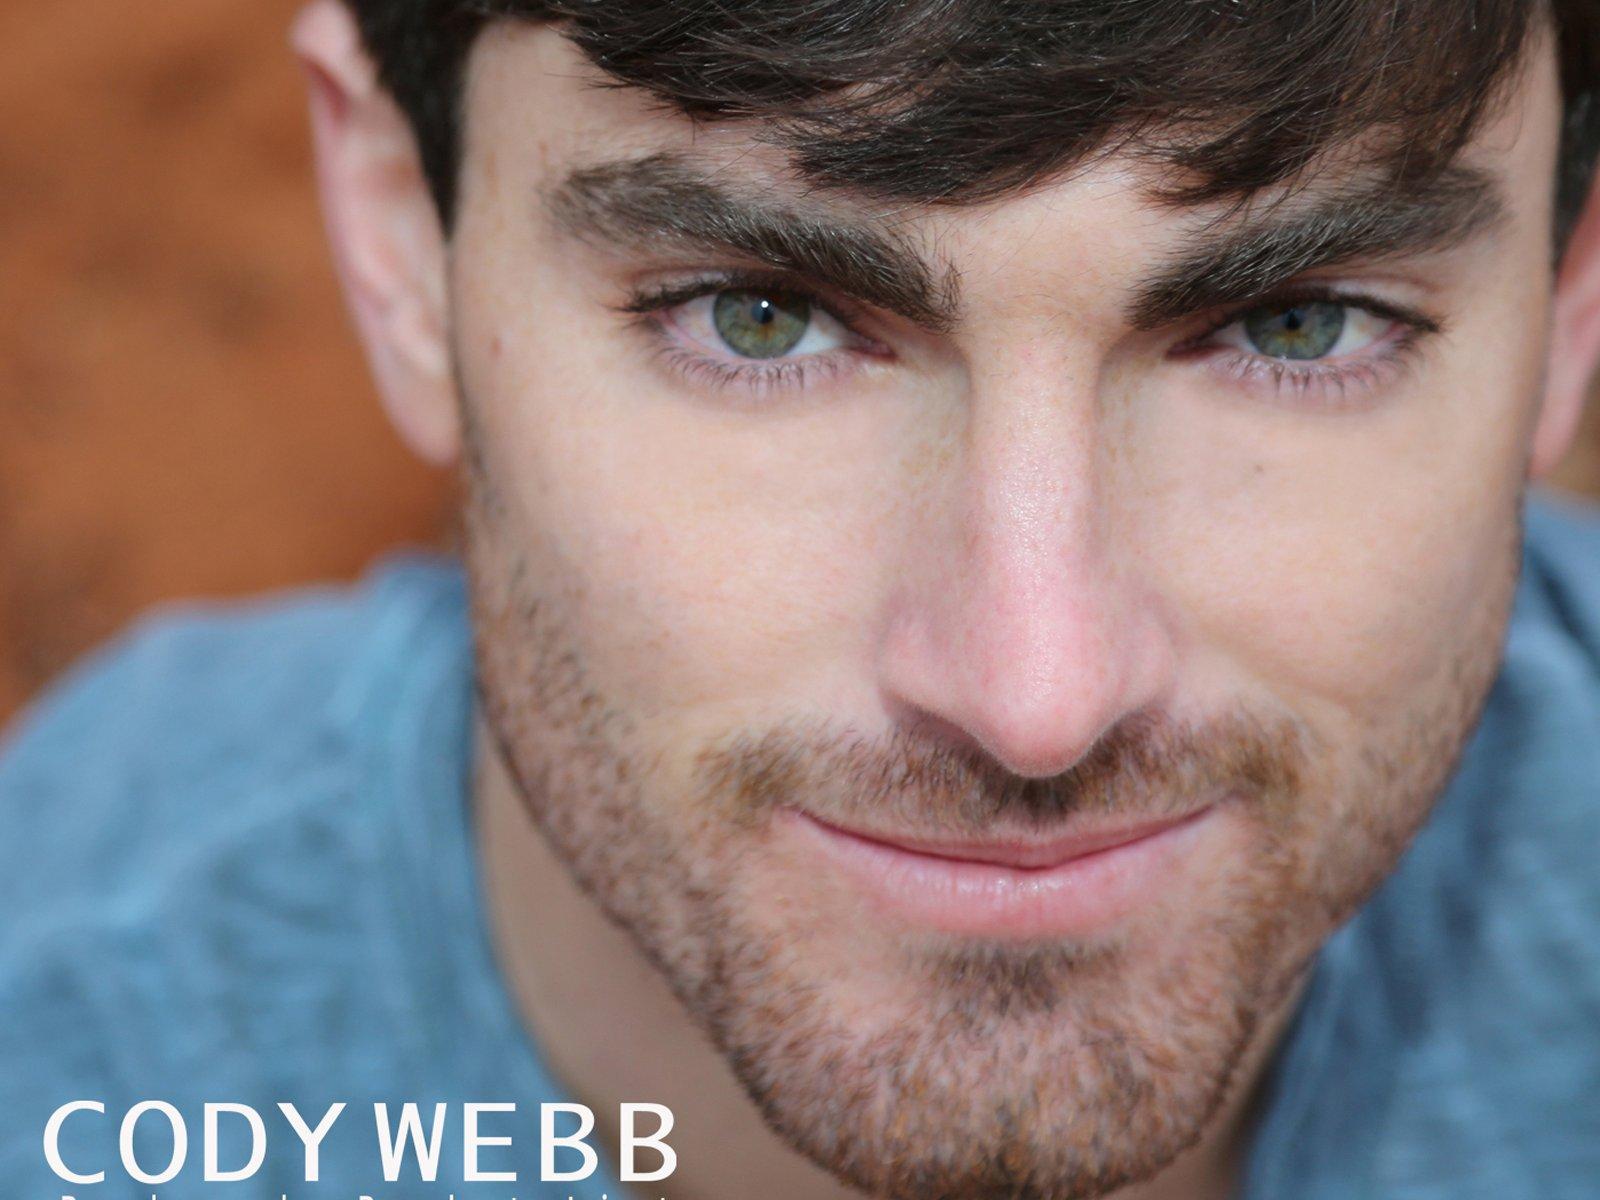 Image for Cody Webb